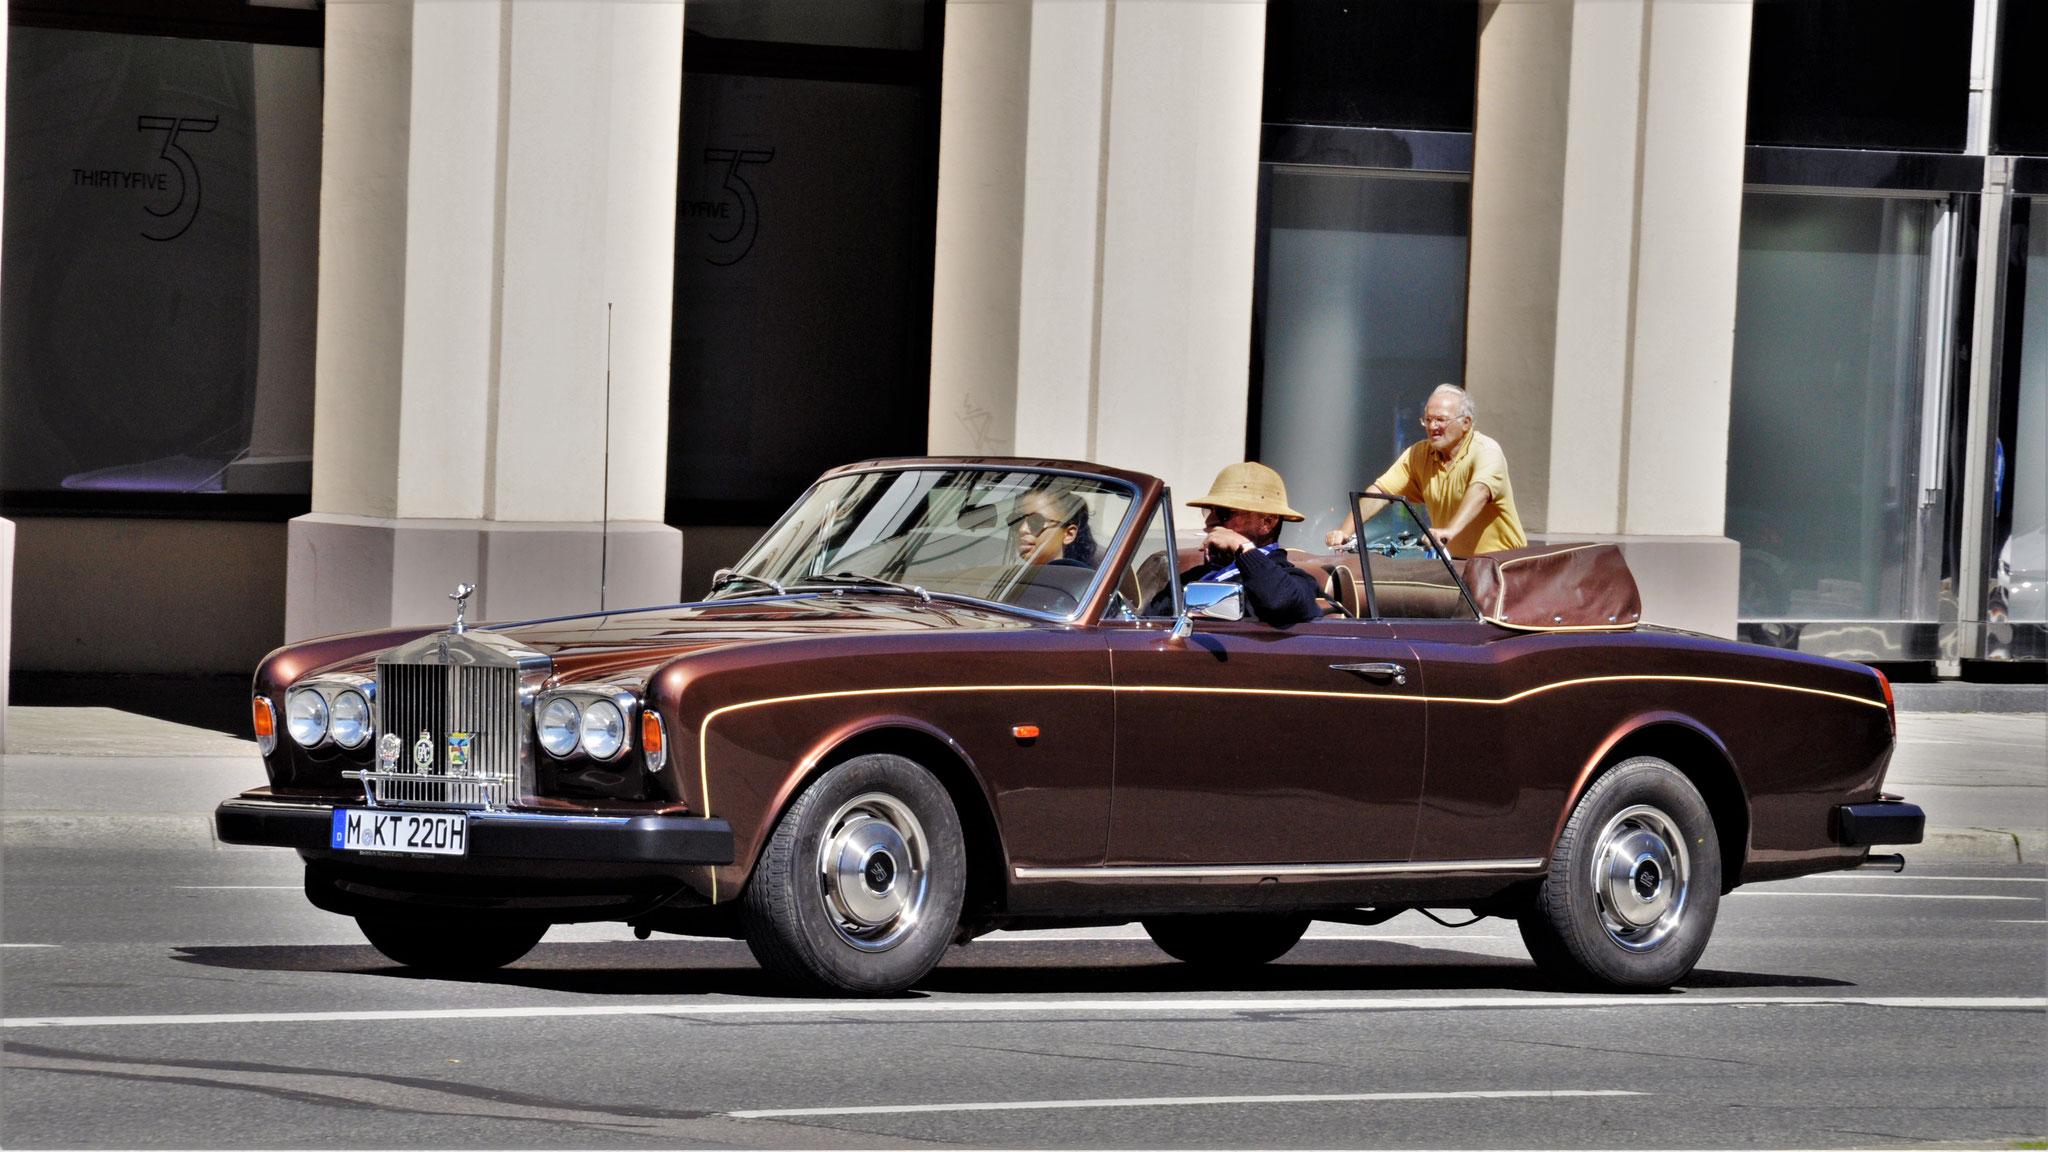 Rolls Royce Corniche - TM-KT-220H